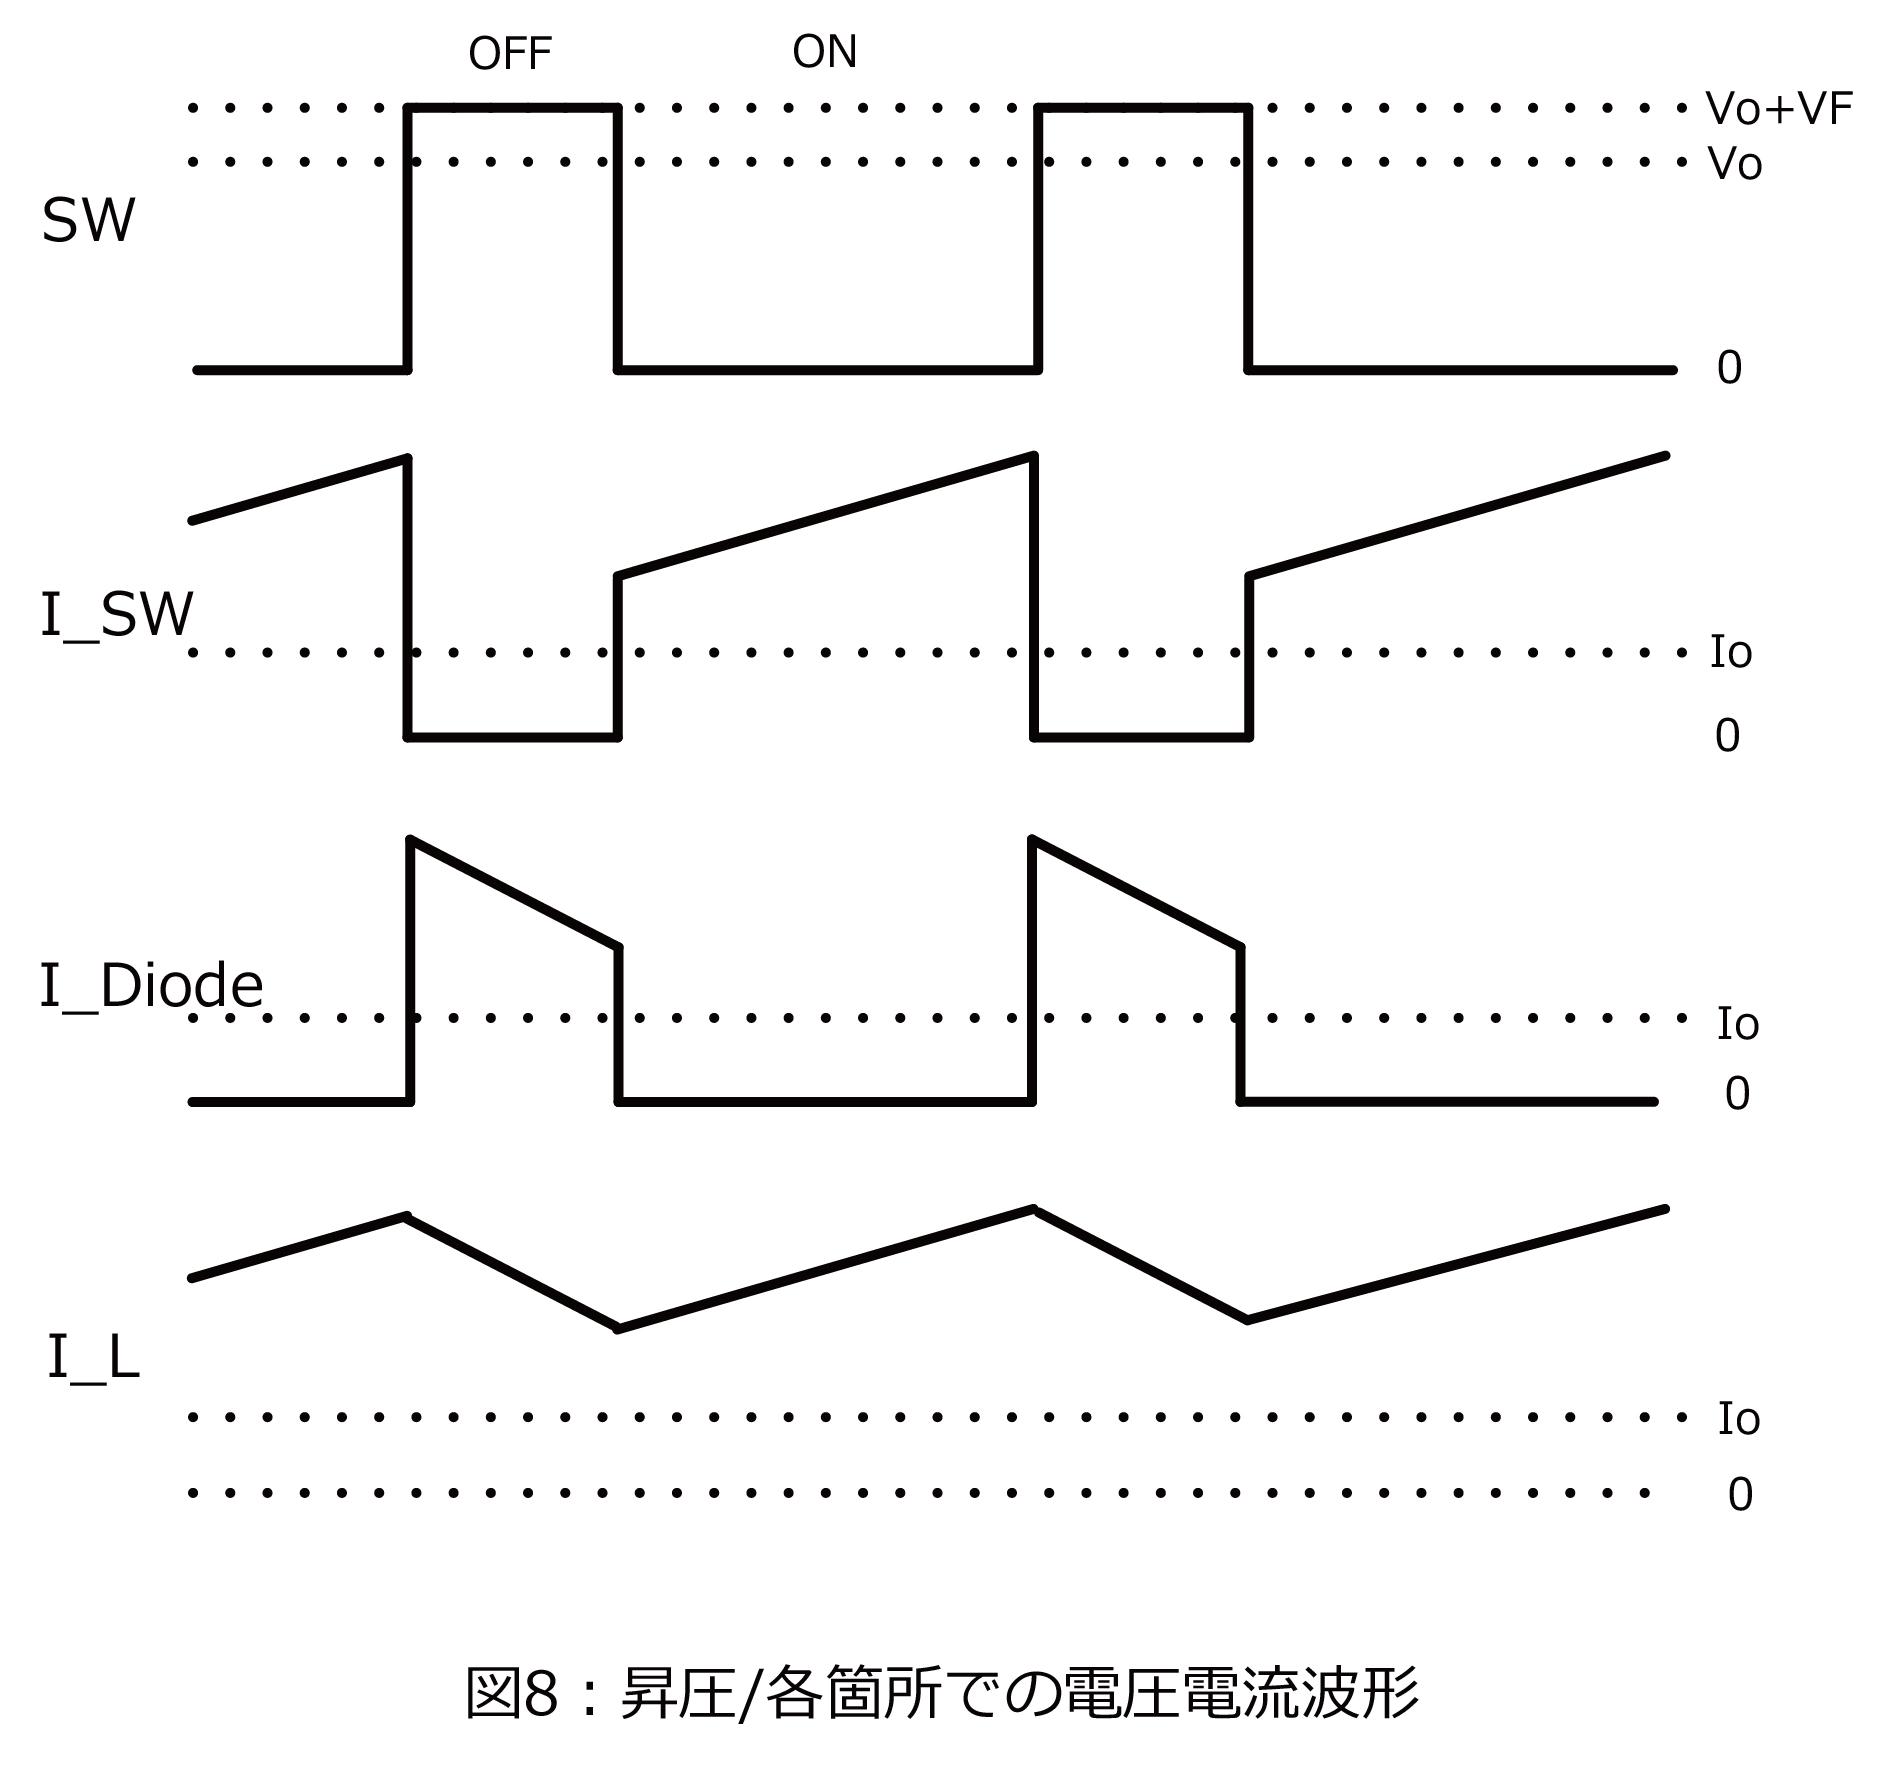 昇圧/各箇所での電圧電流波形